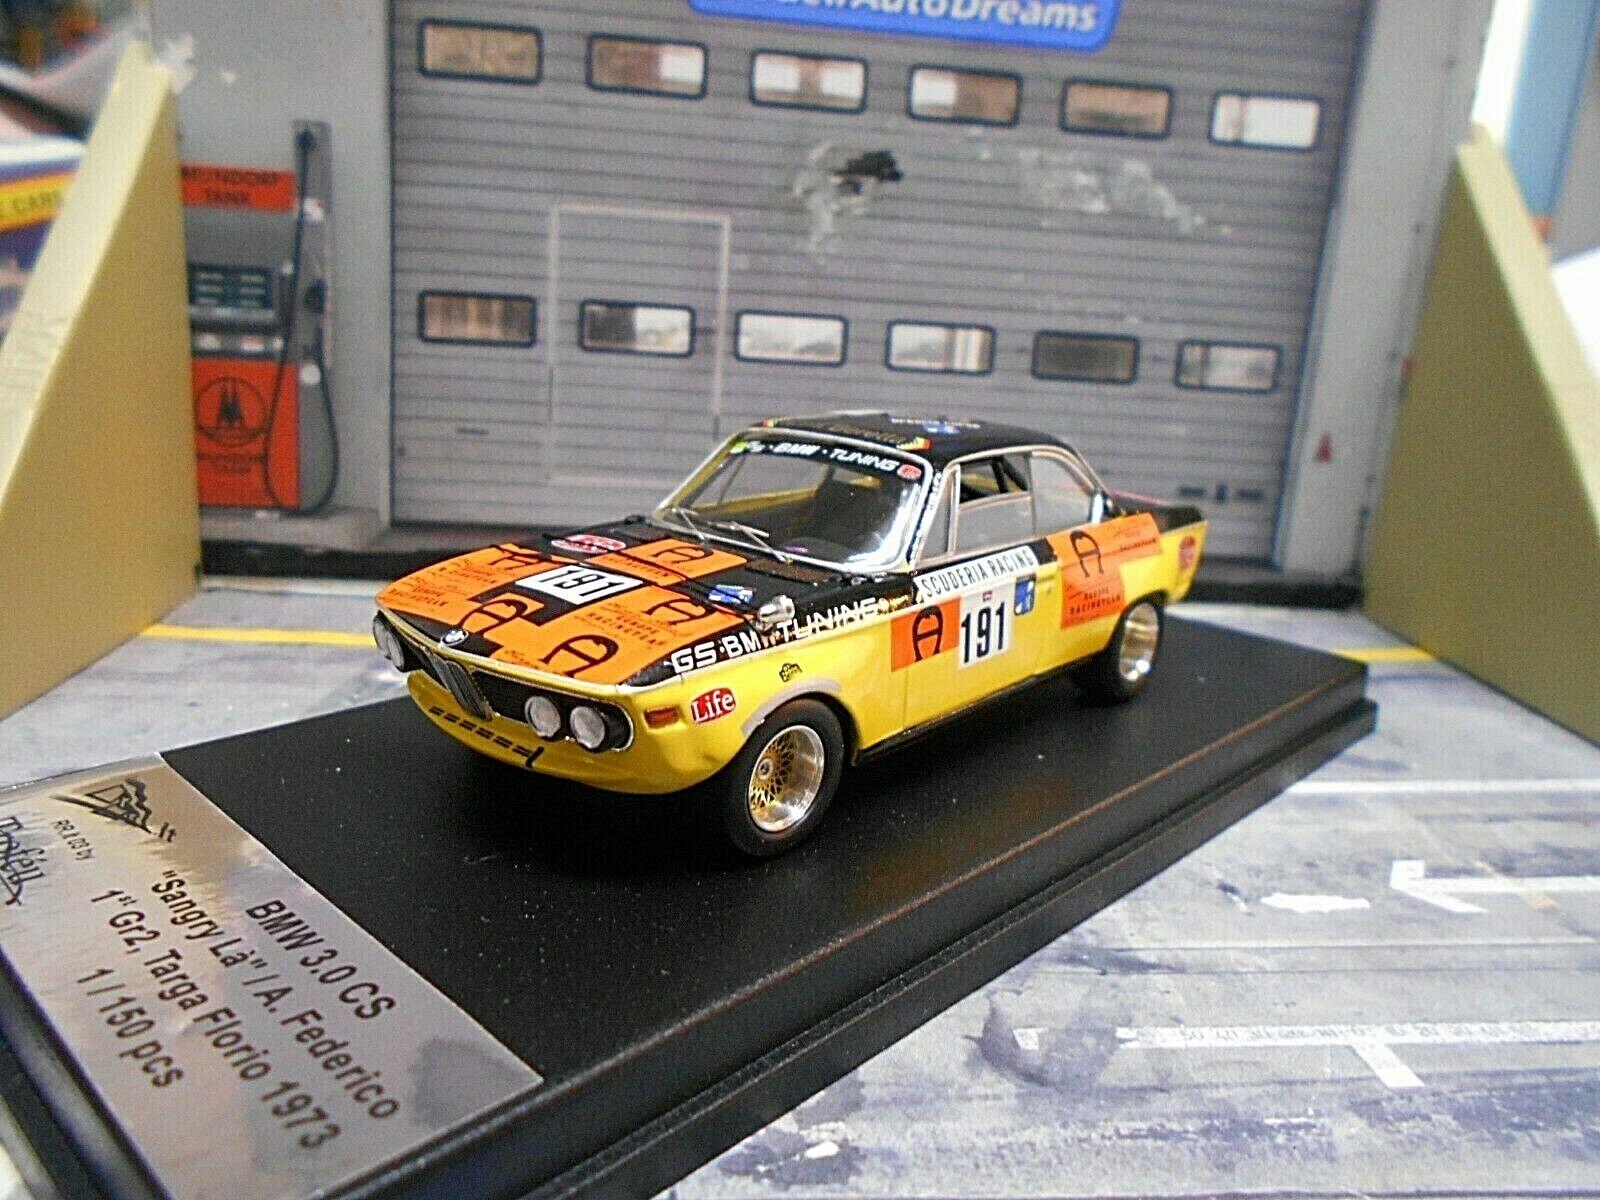 BMW 3.0 CS CSI Coupe GS Tuning Targa Florio  191 1973 Scuderia Beret Scala 1 43